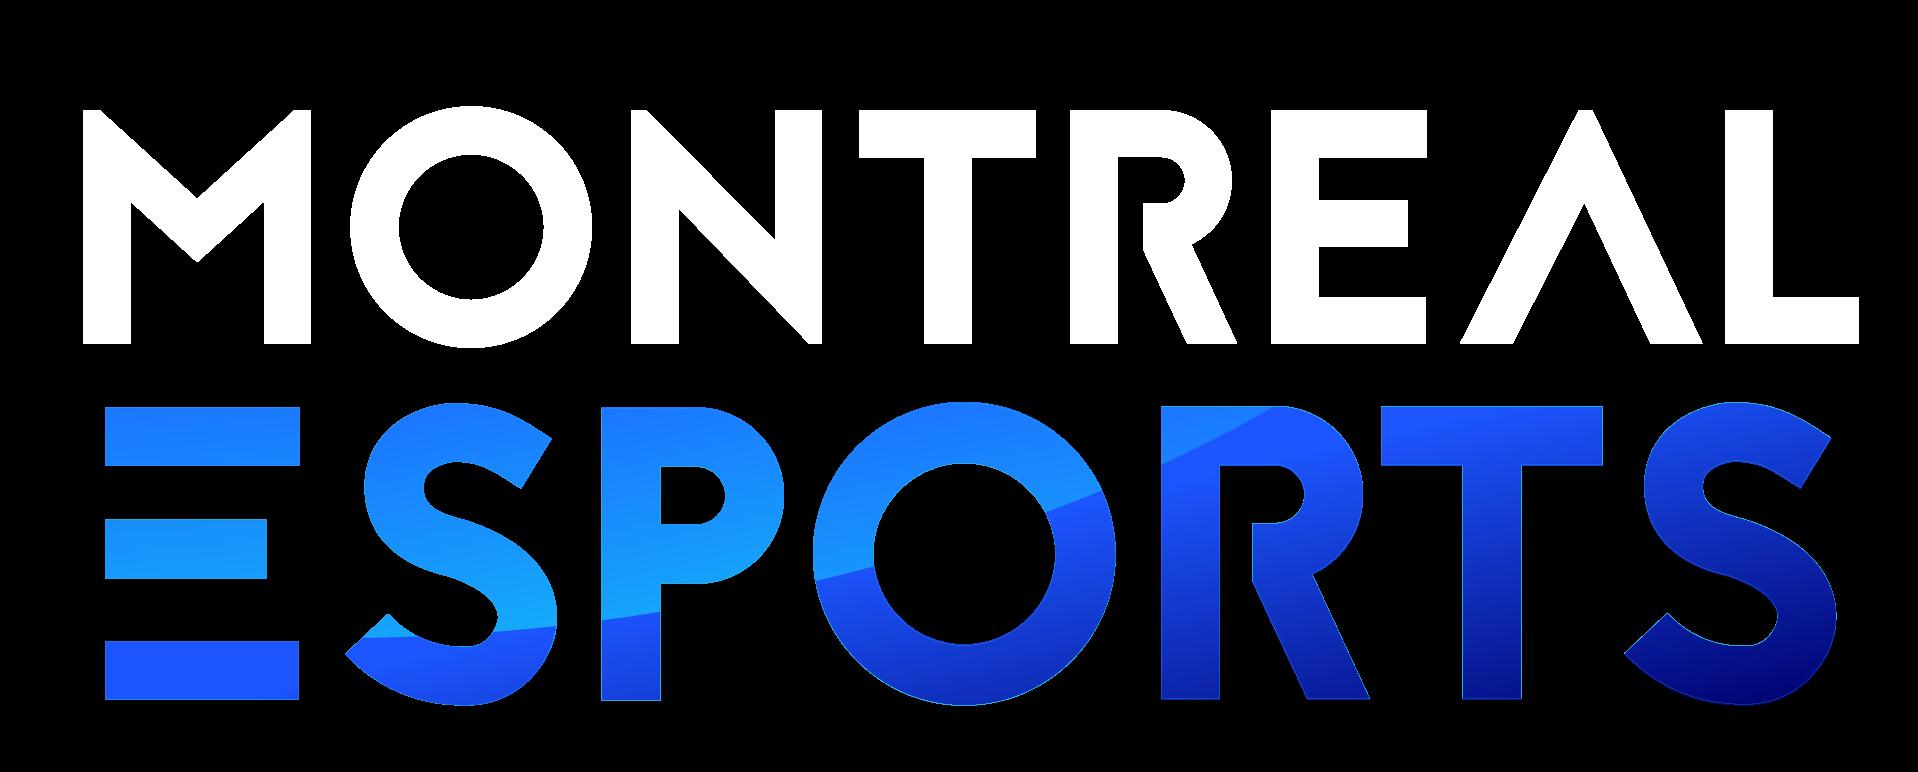 Montreal Esports.